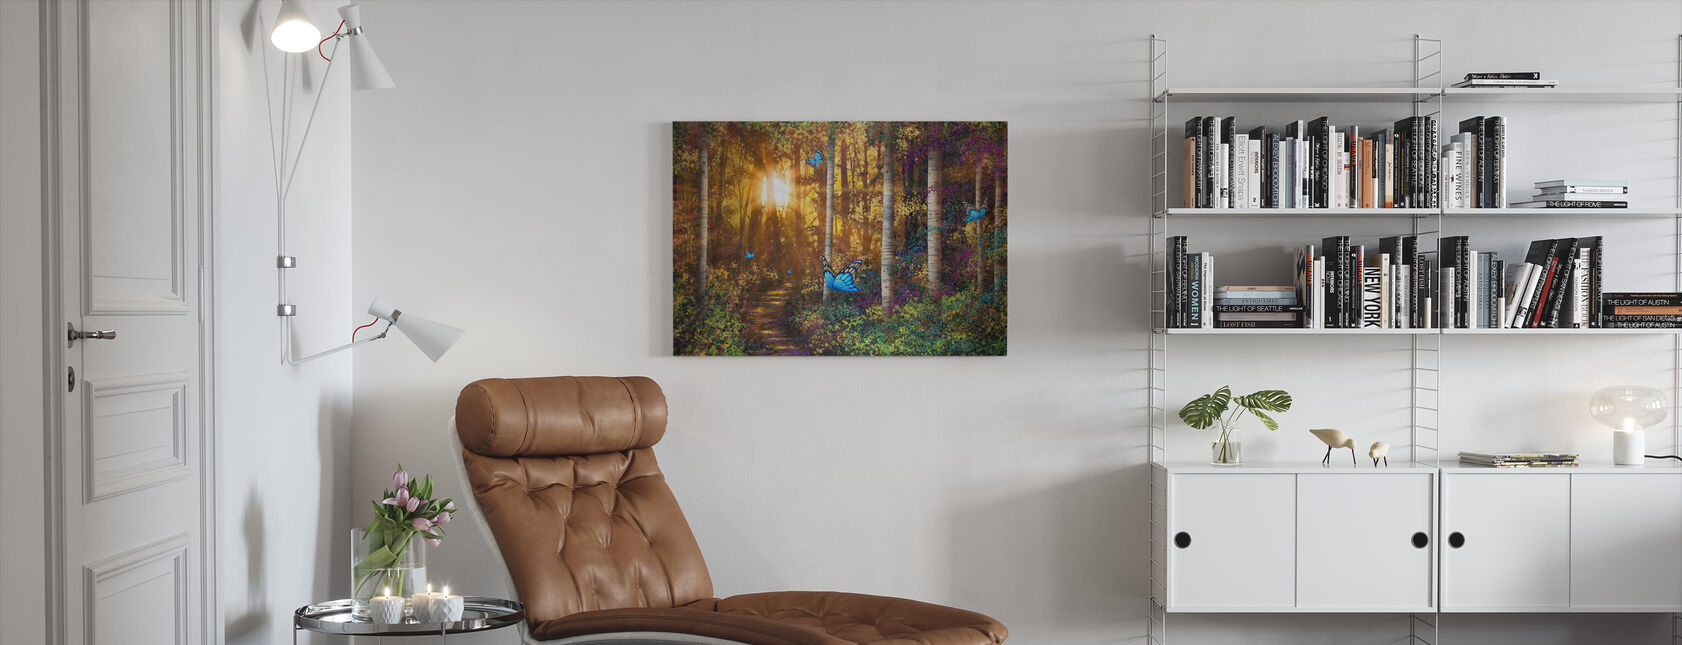 Metsän polku perhosia - Canvastaulu - Olohuone